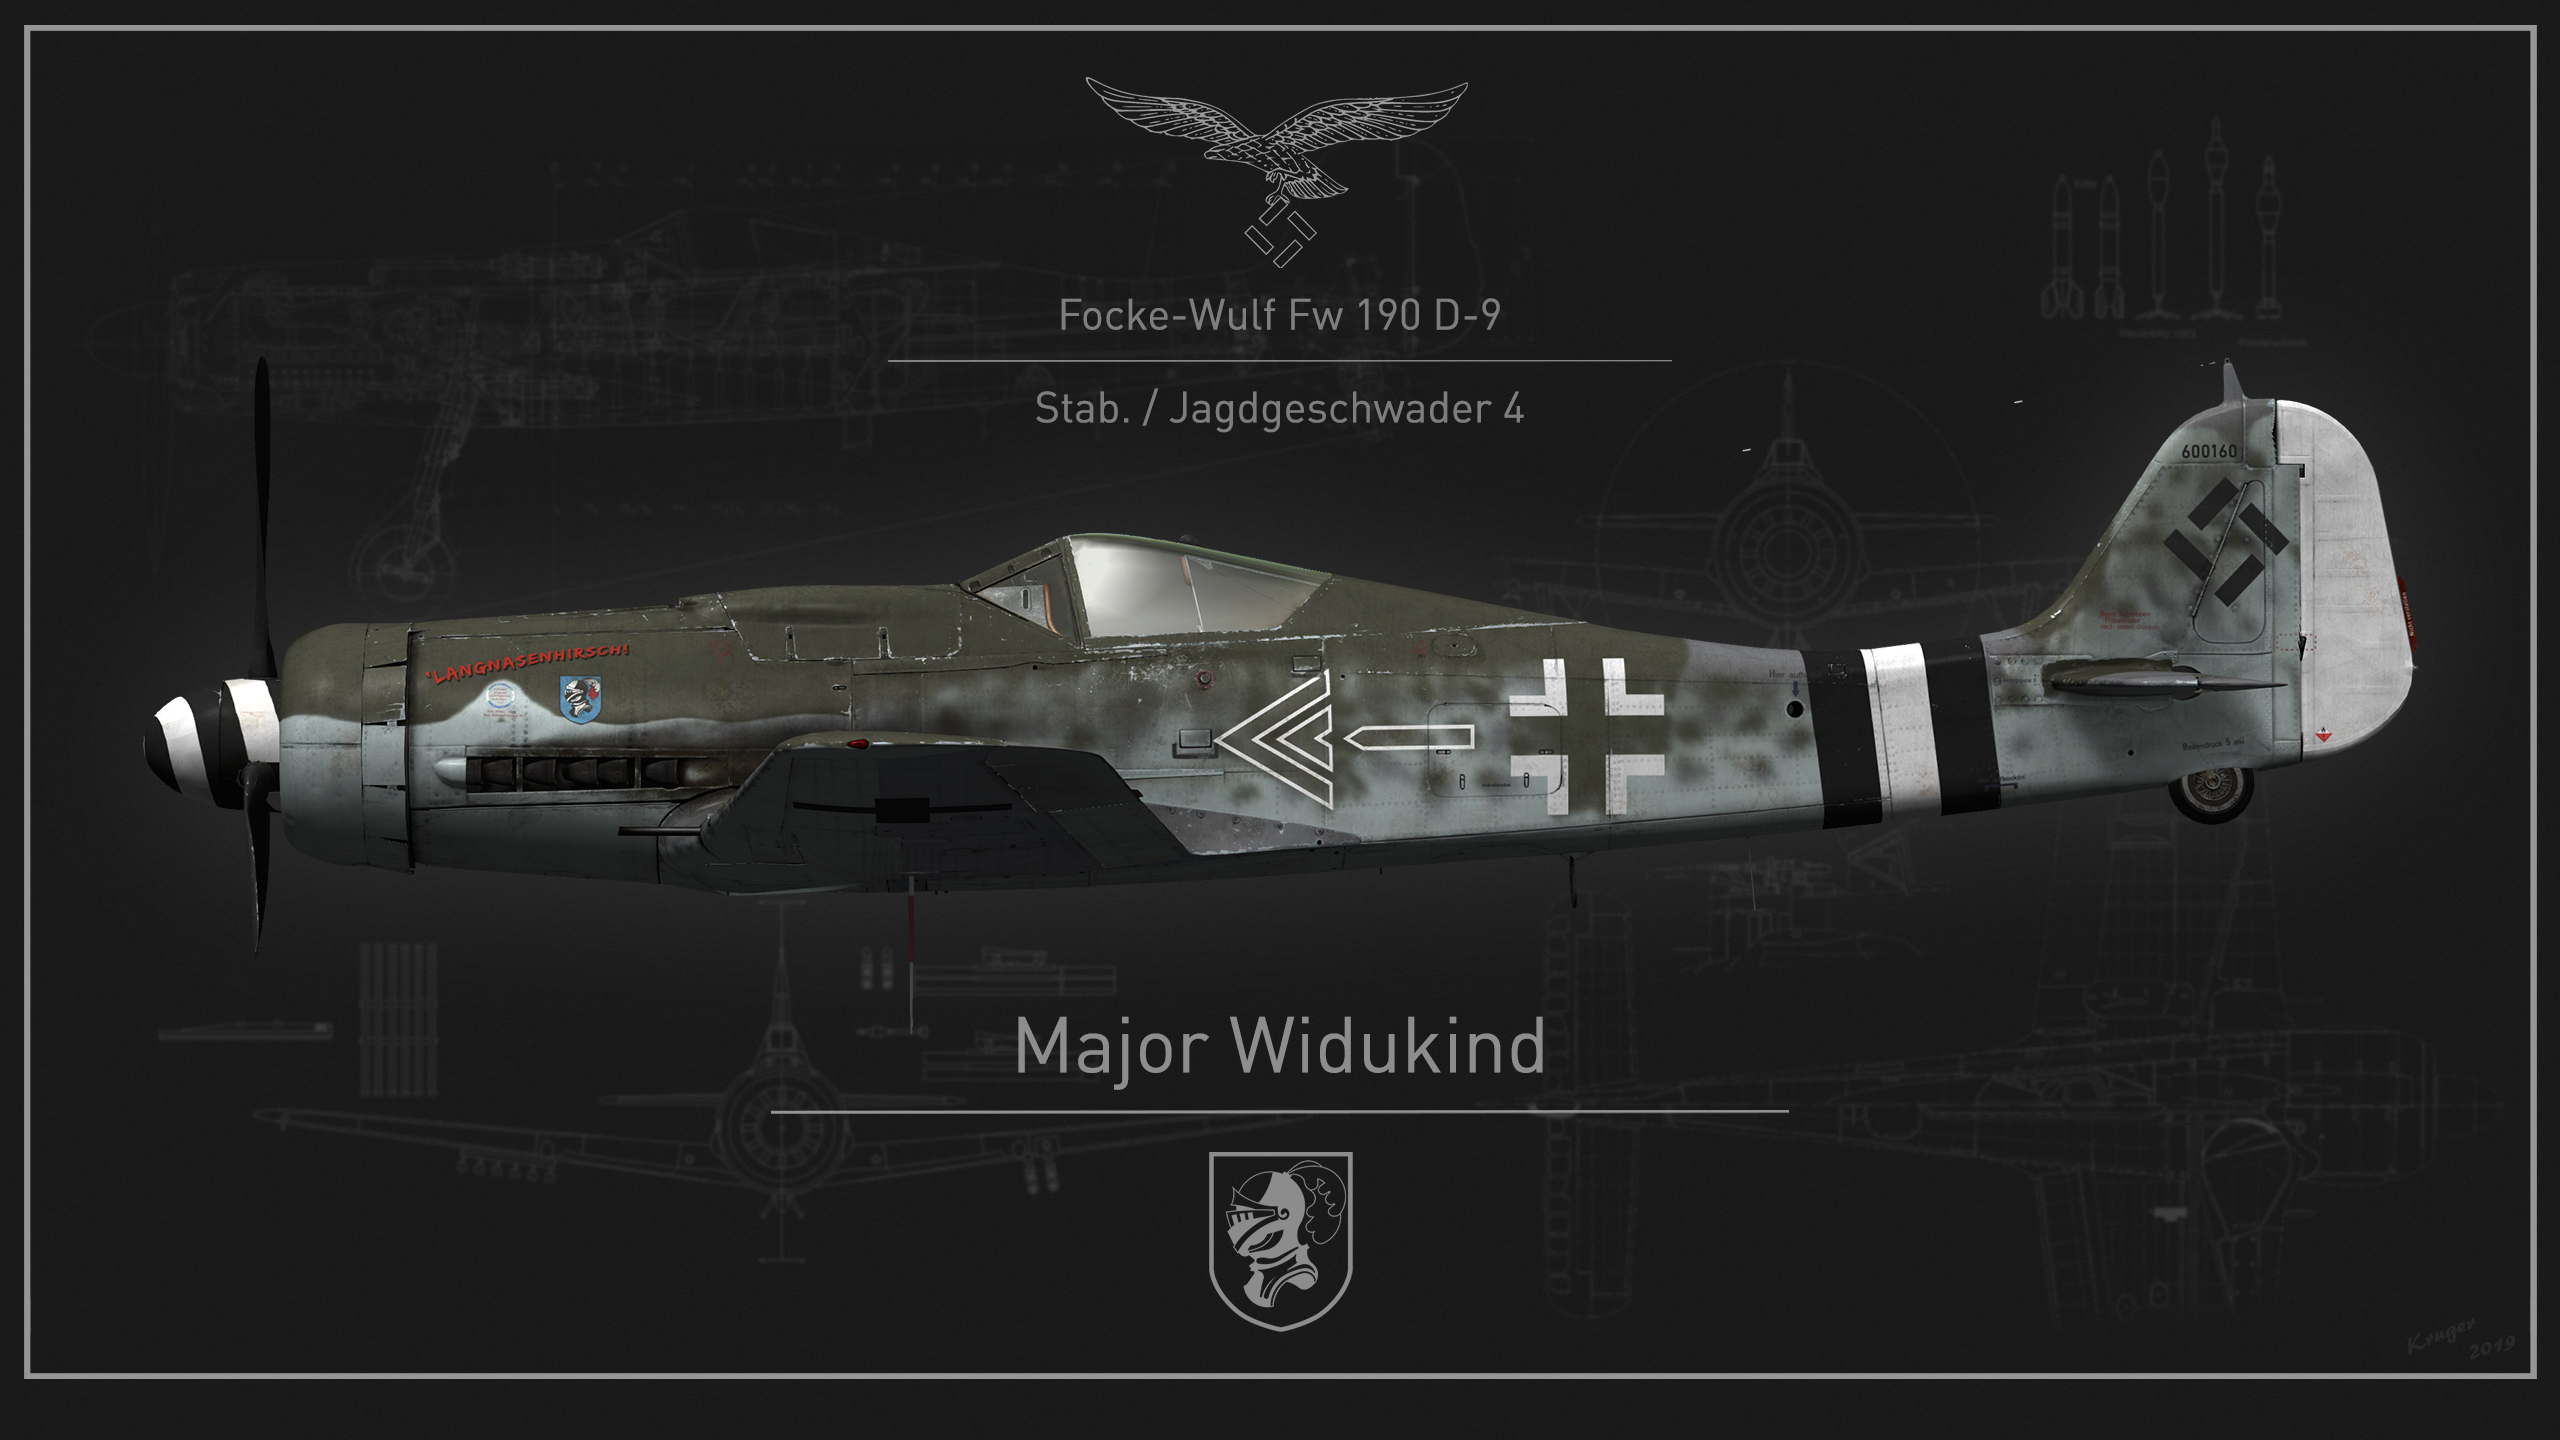 Widukind-2560x1440.png